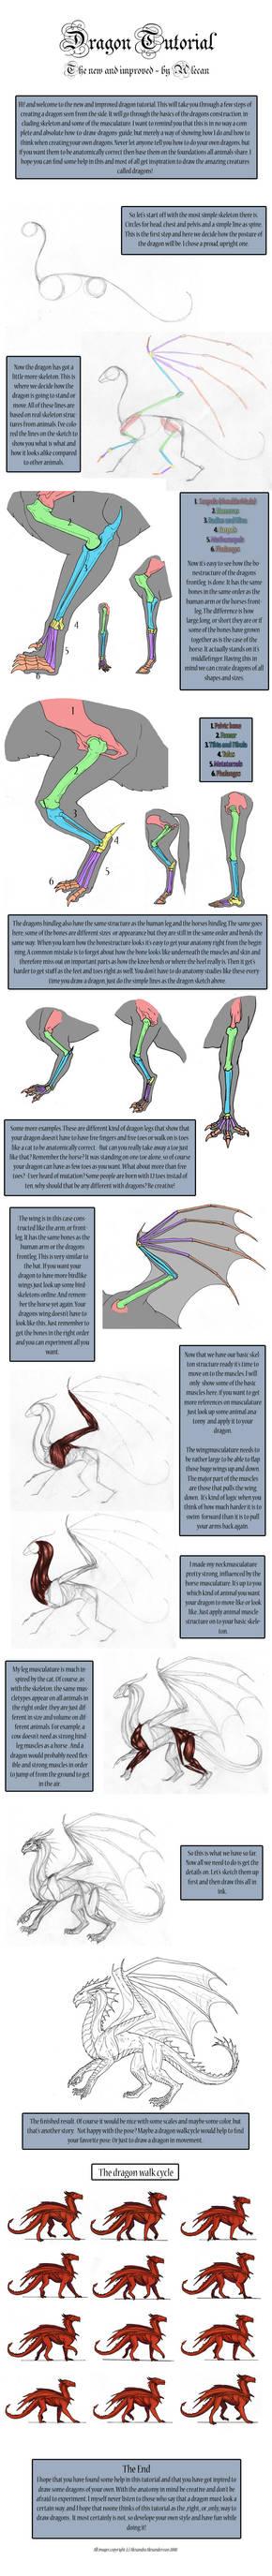 Dragon Tutorial - New